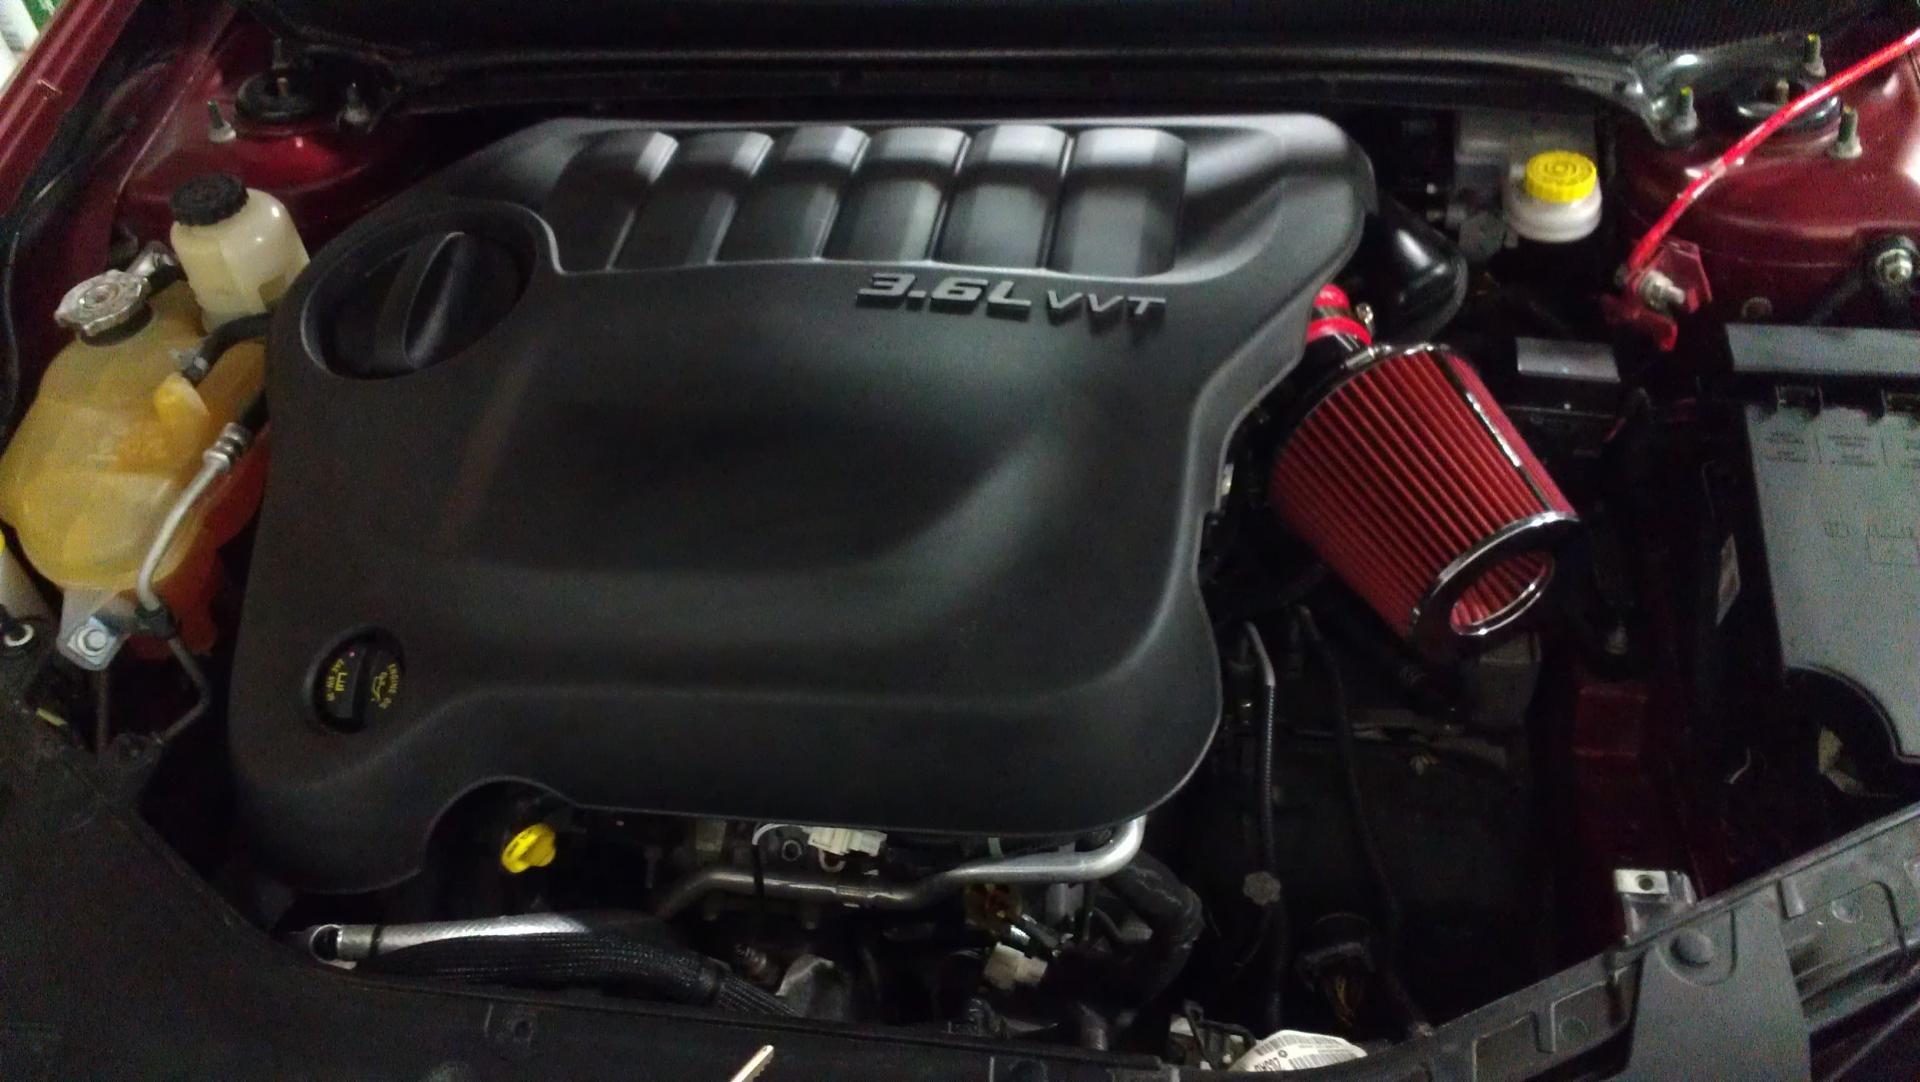 D Cold Air Intake Imag on 2012 Chrysler 200 Cold Air Intake